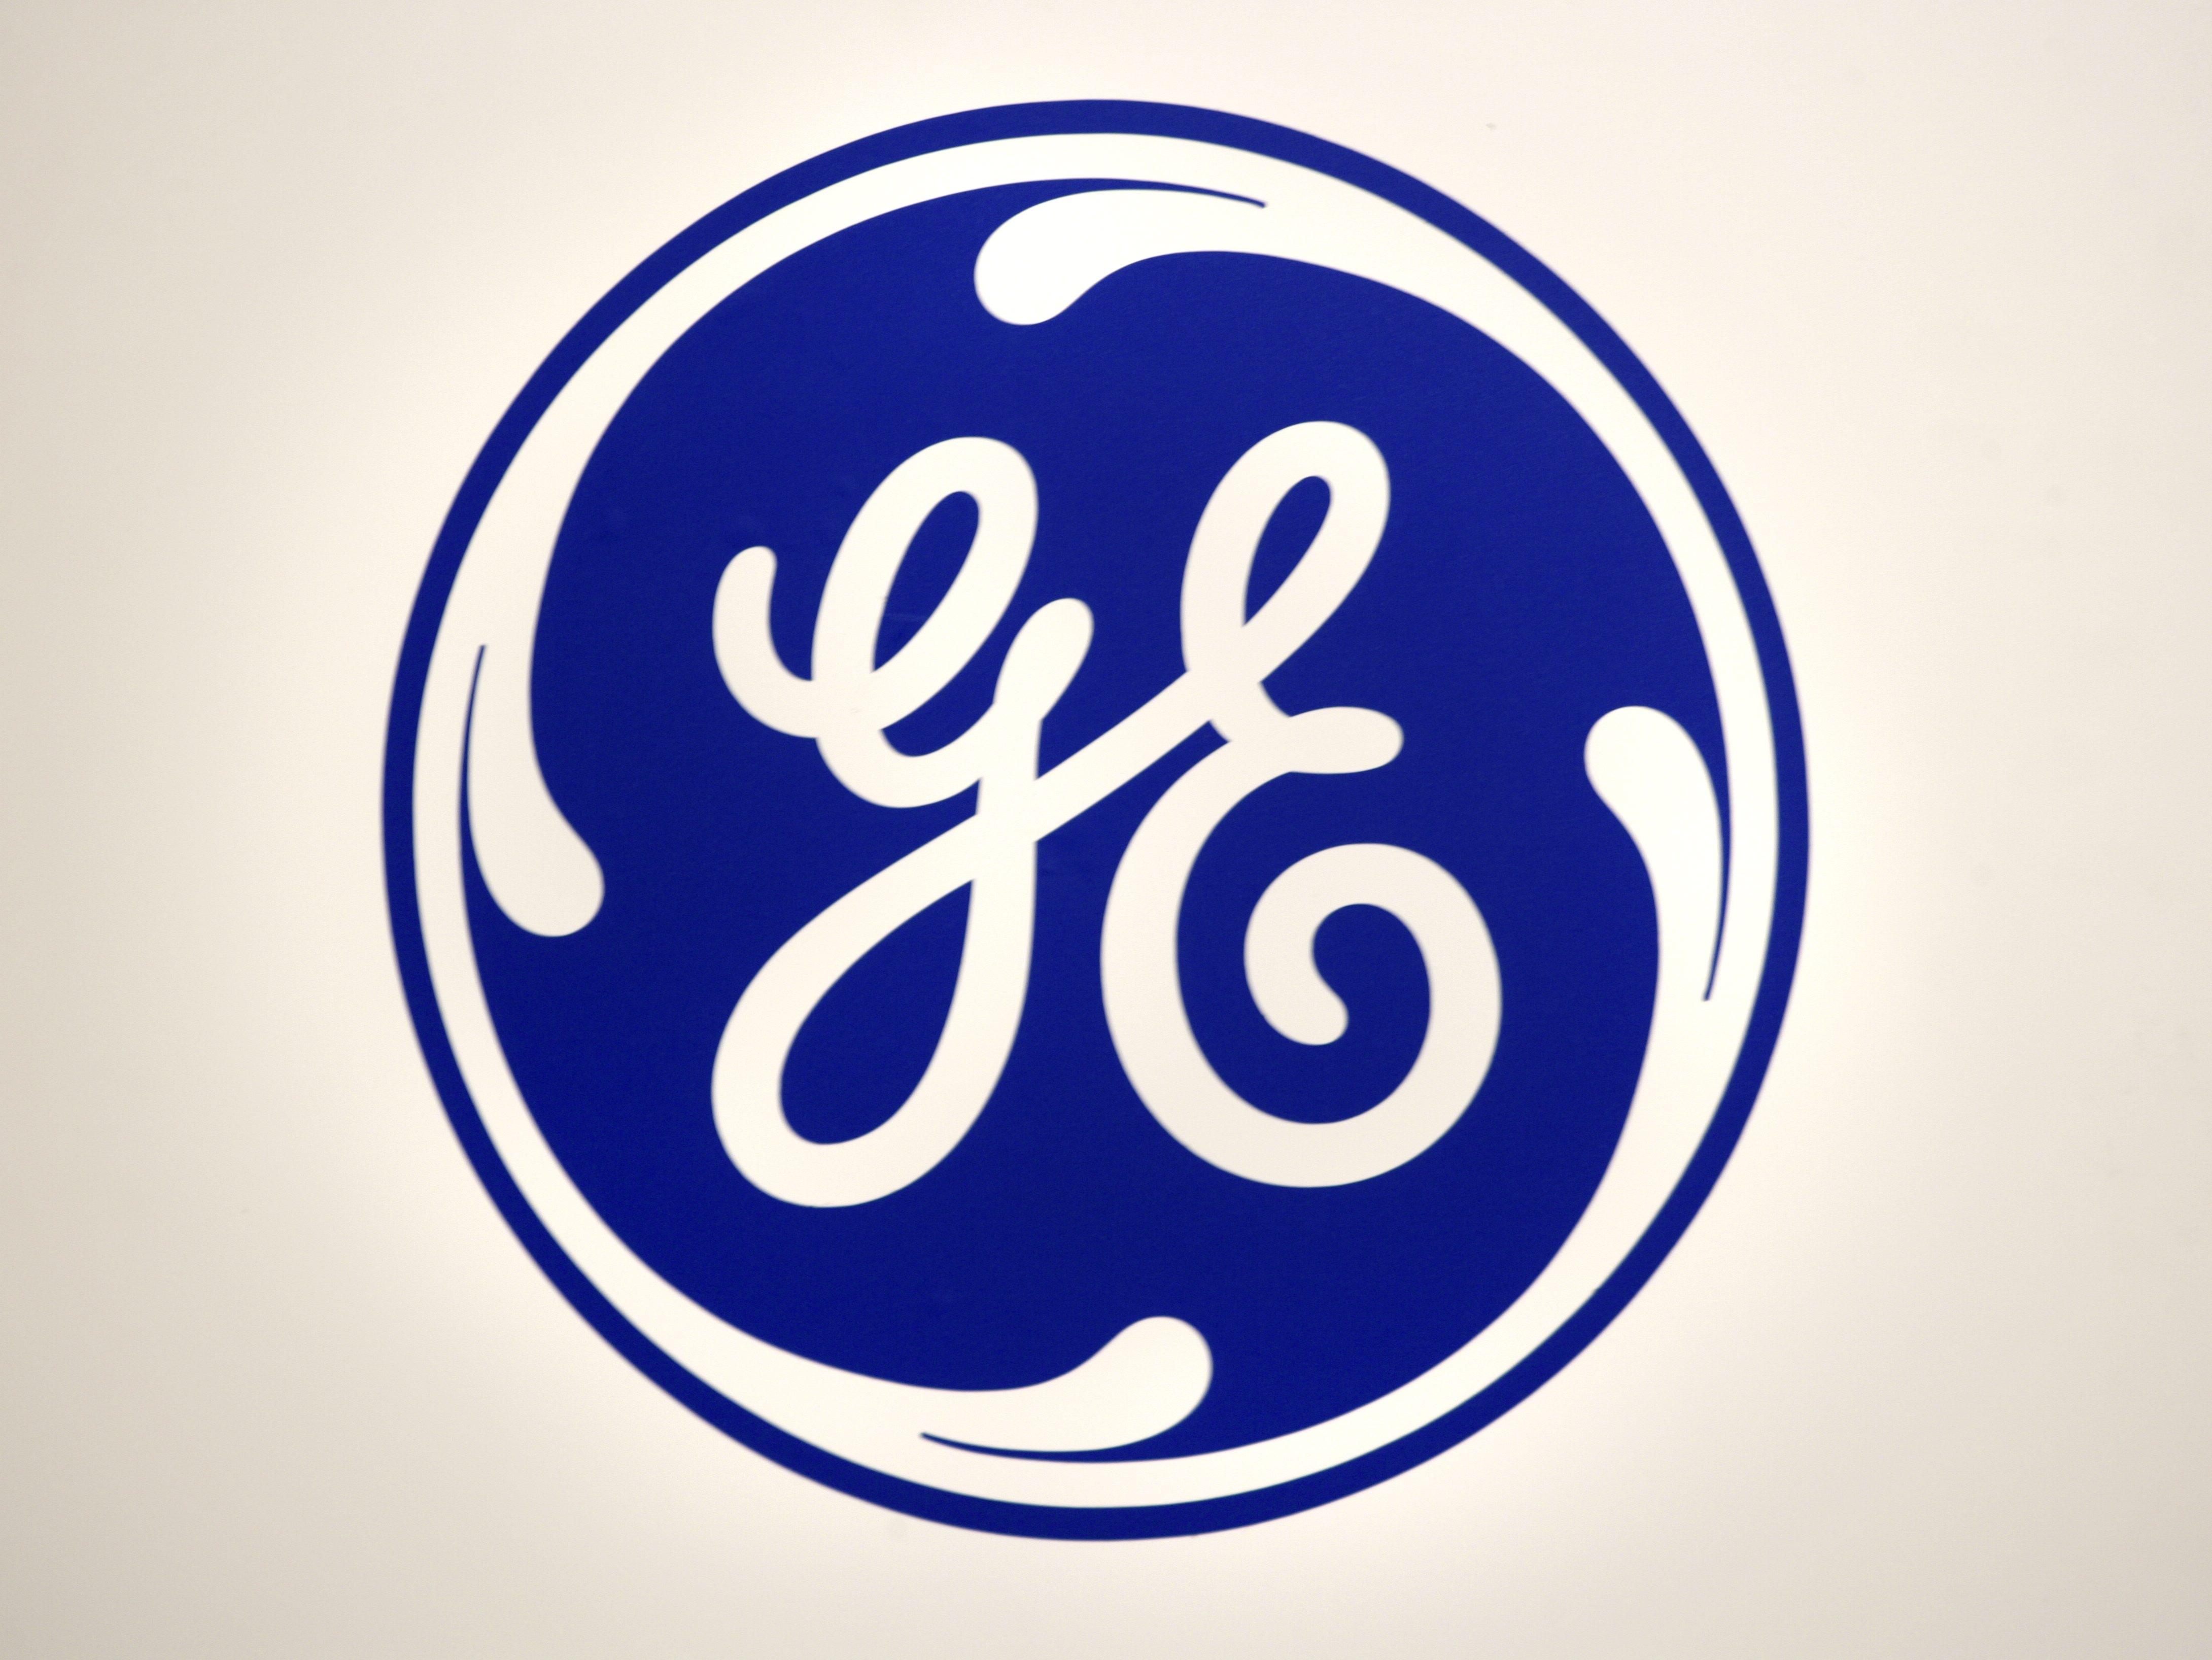 Logo of General Electric GE.